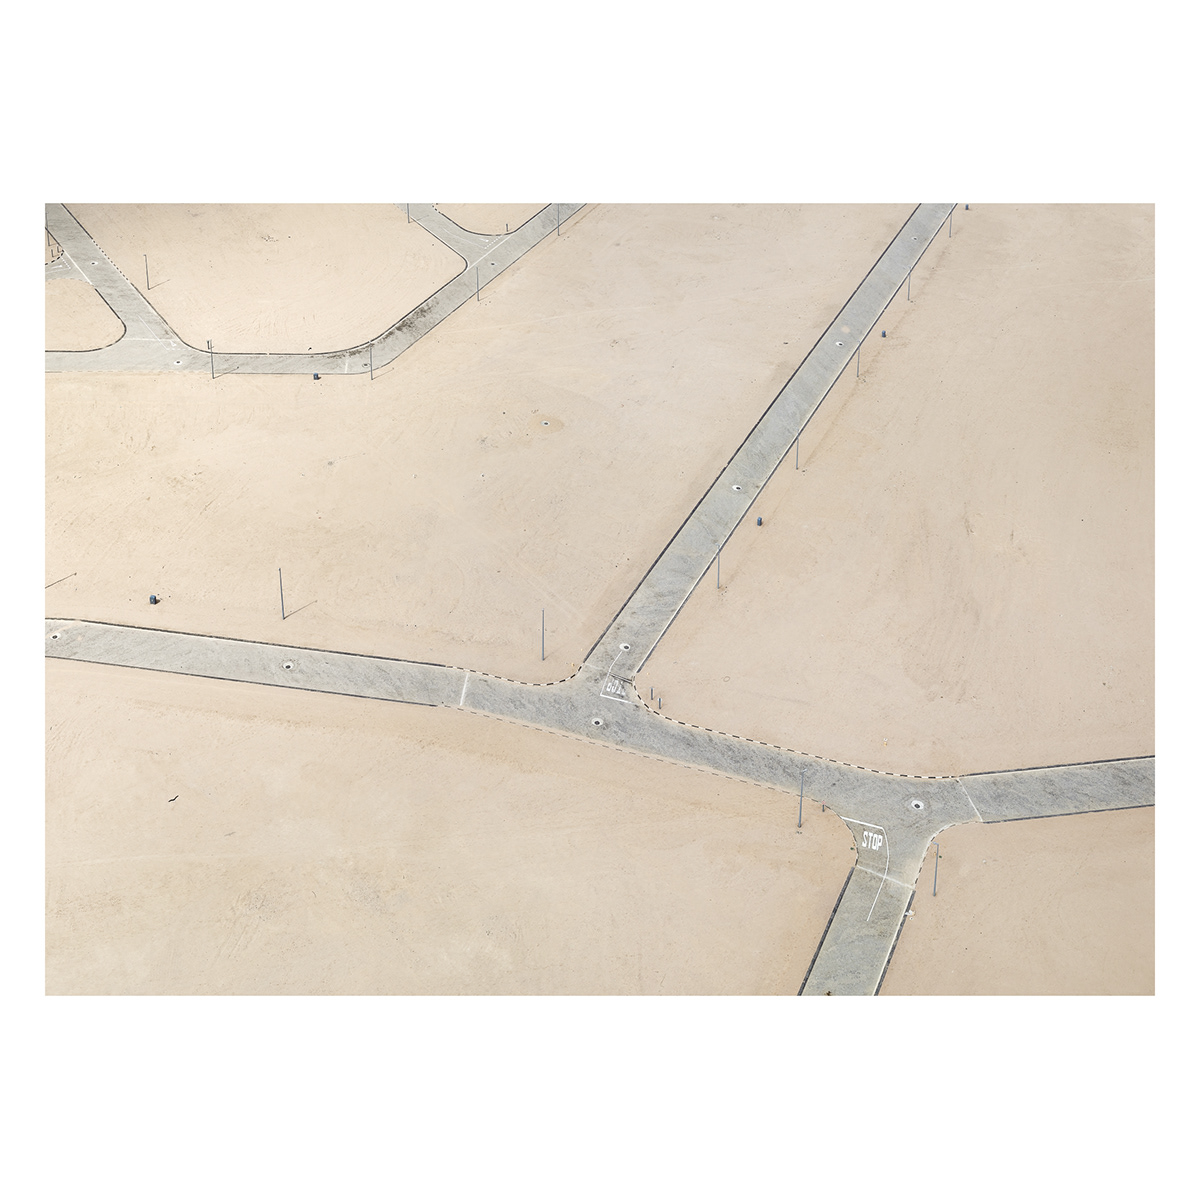 minimal Landscape contemporary art environmental aerial landscape Aerial Photography  Aerial Photography